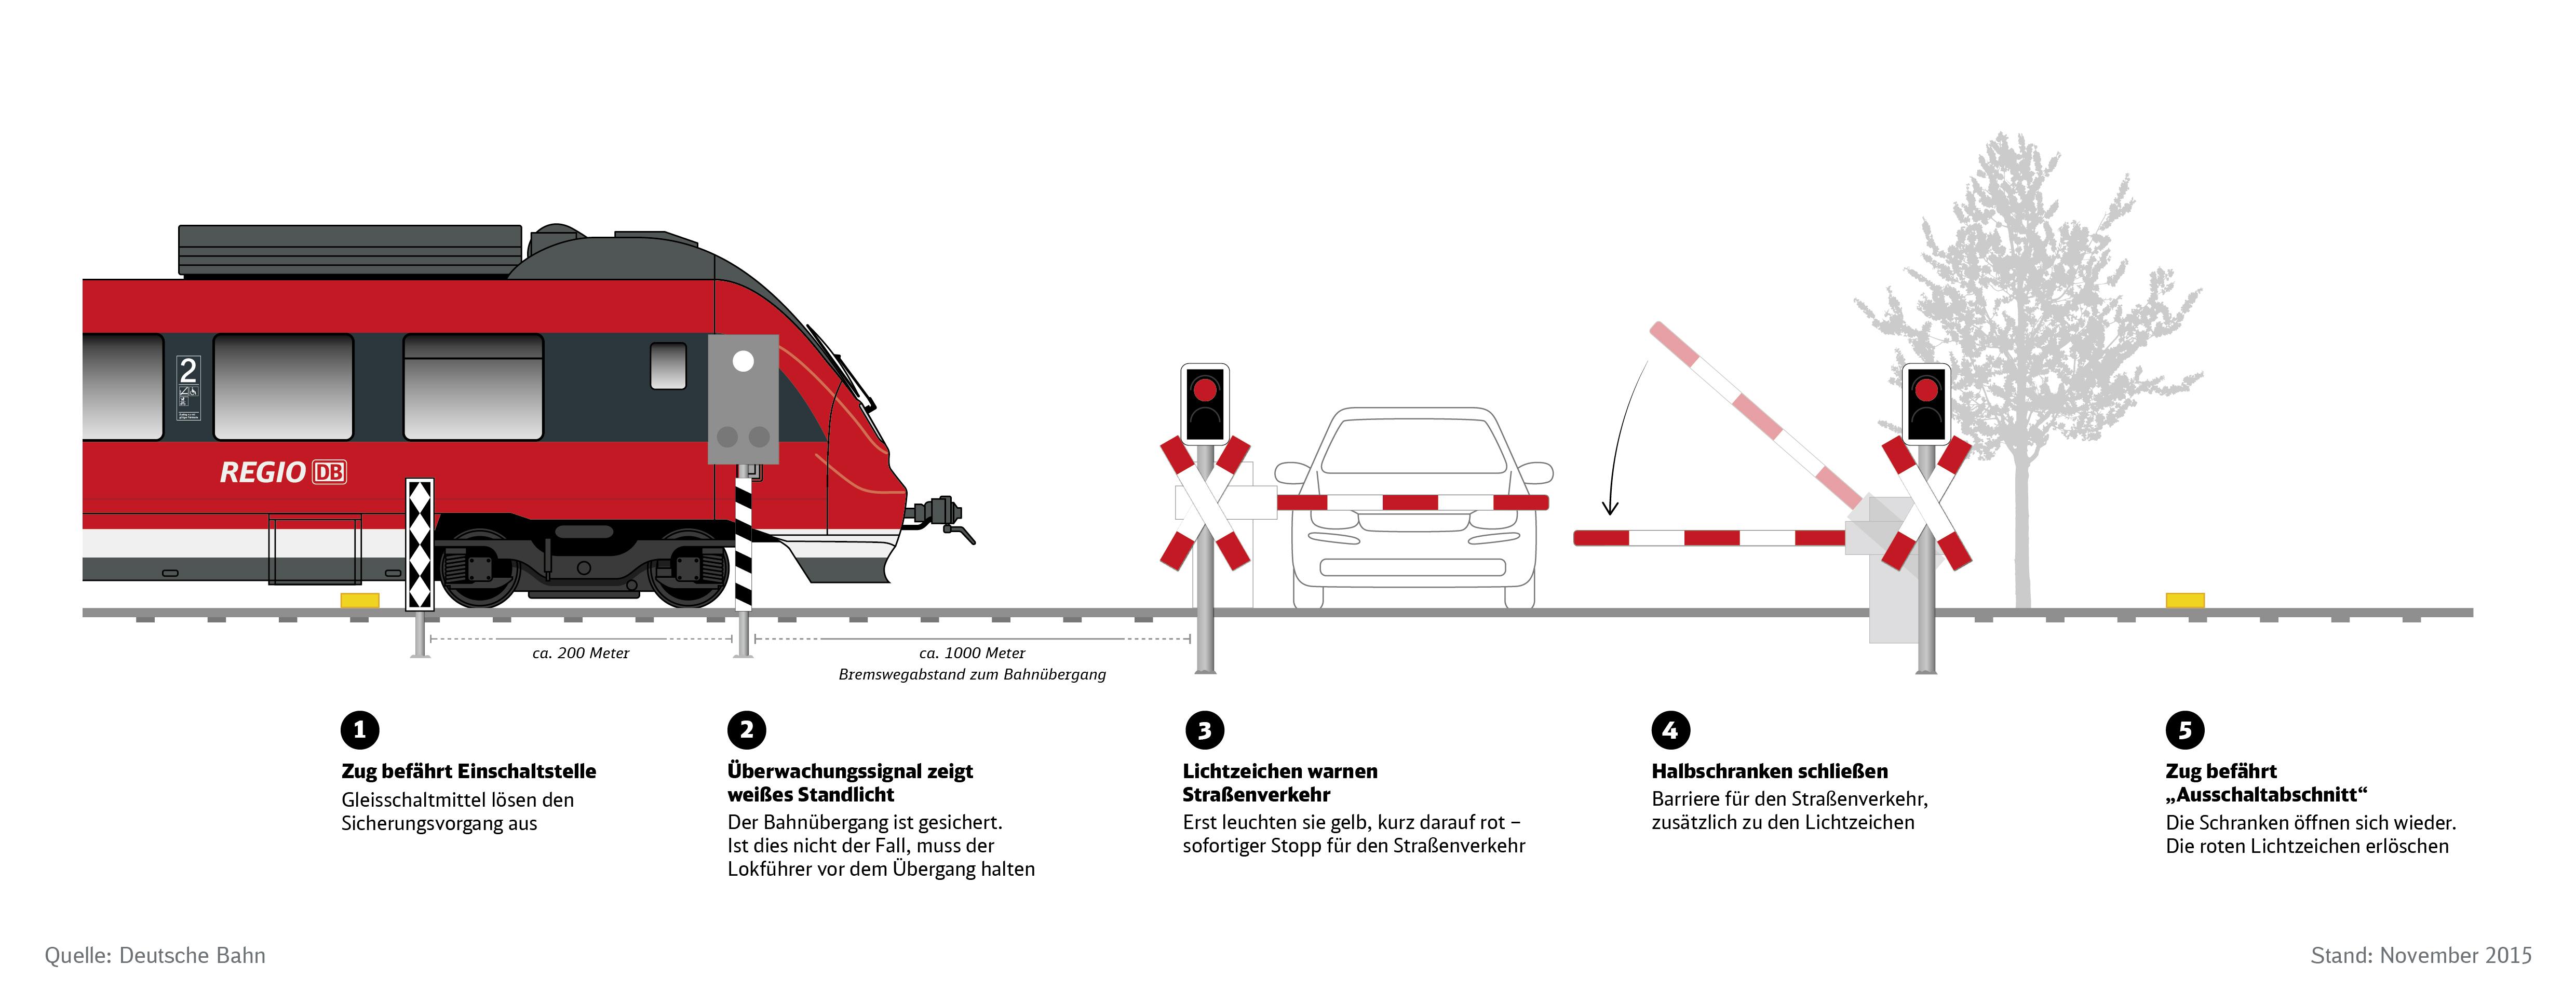 Arriva - a DB Company | Deutsche Bahn AG